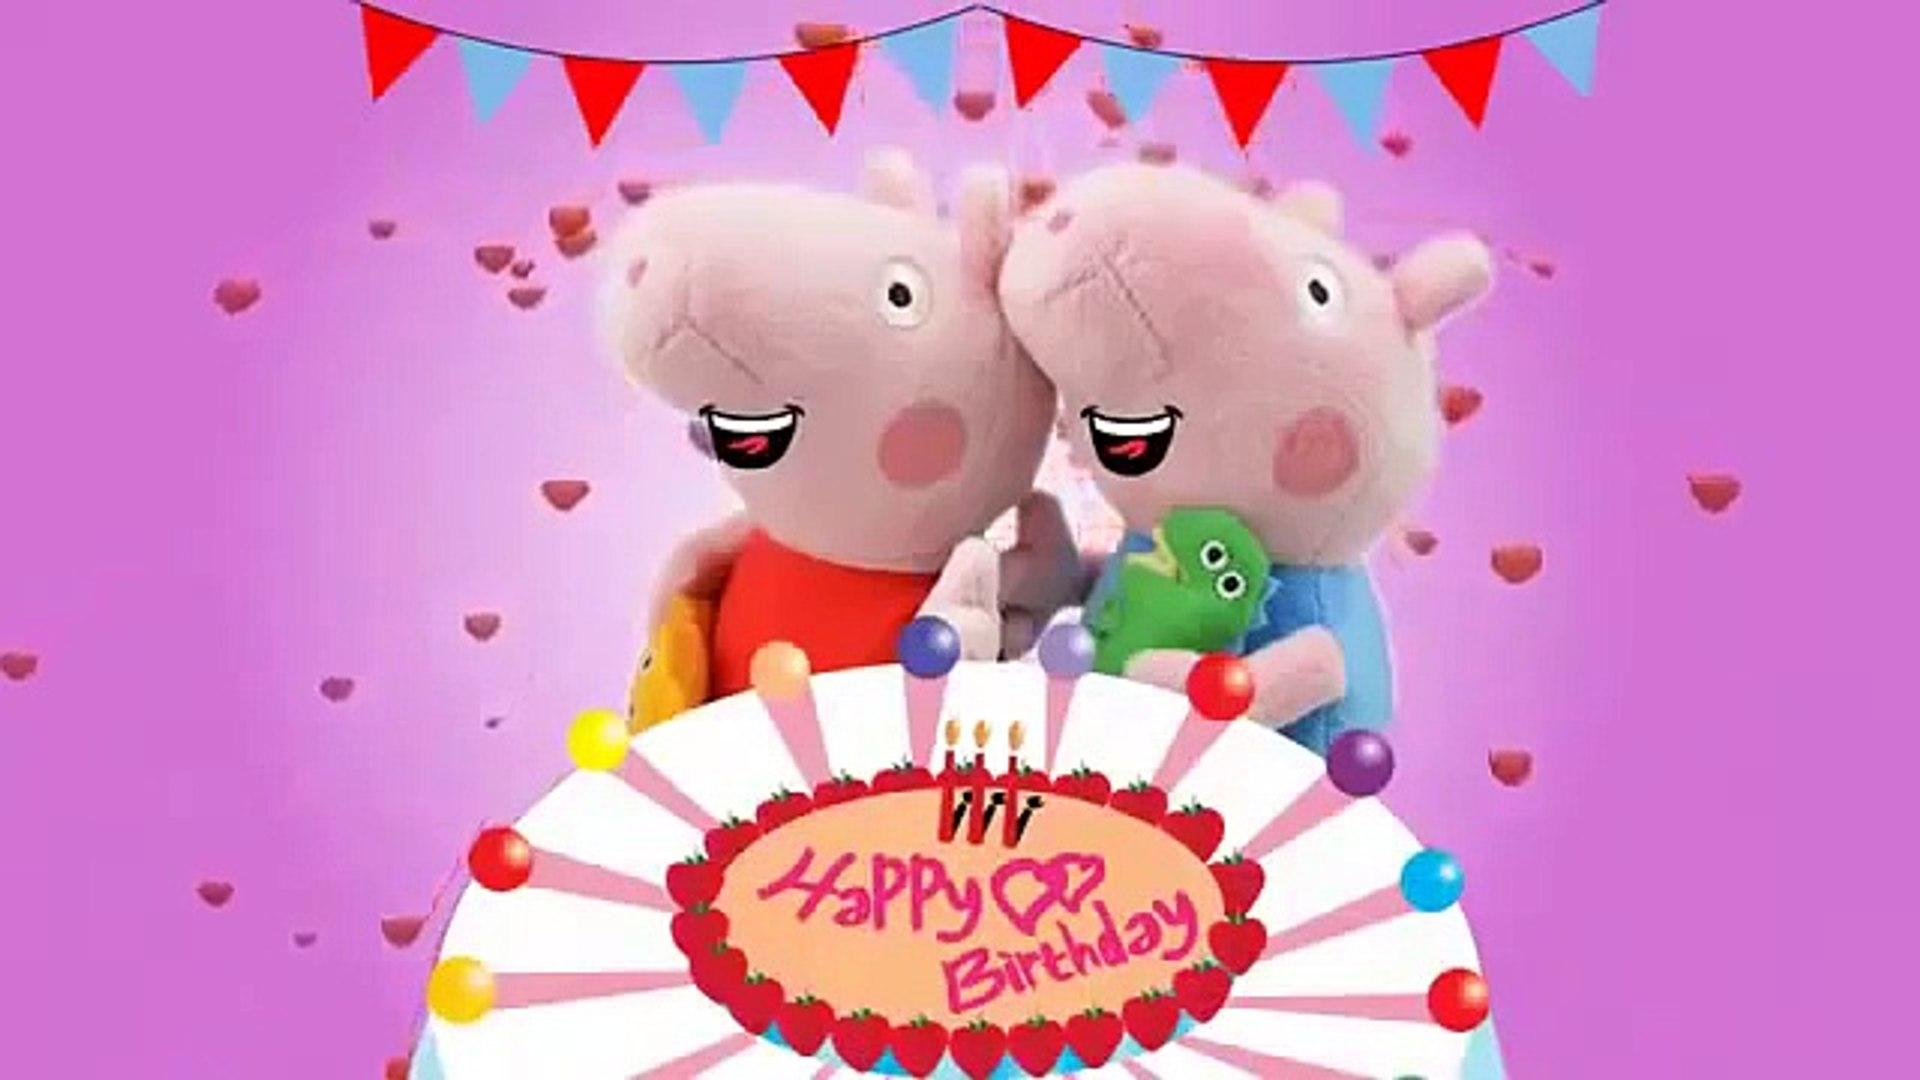 Peppa Pig Song Happy Birthday Song Nursery Rhymes For Kids Video Dailymotion